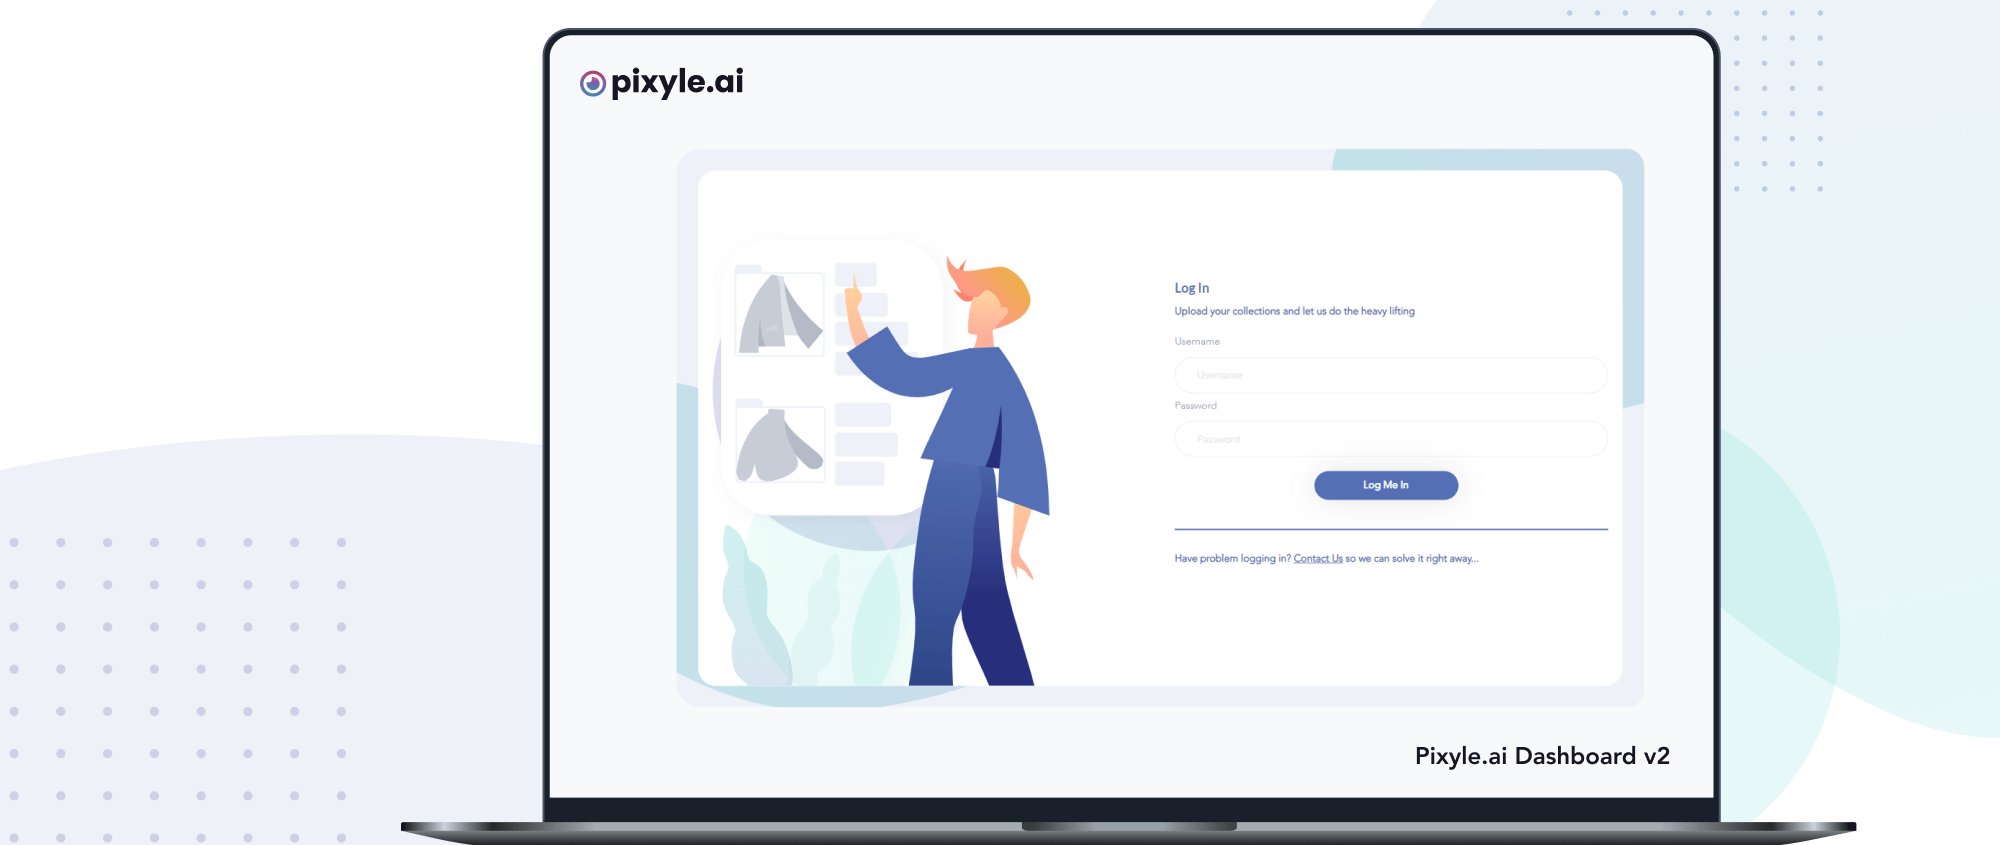 Login form for Pixyle.ai Dashboard v2